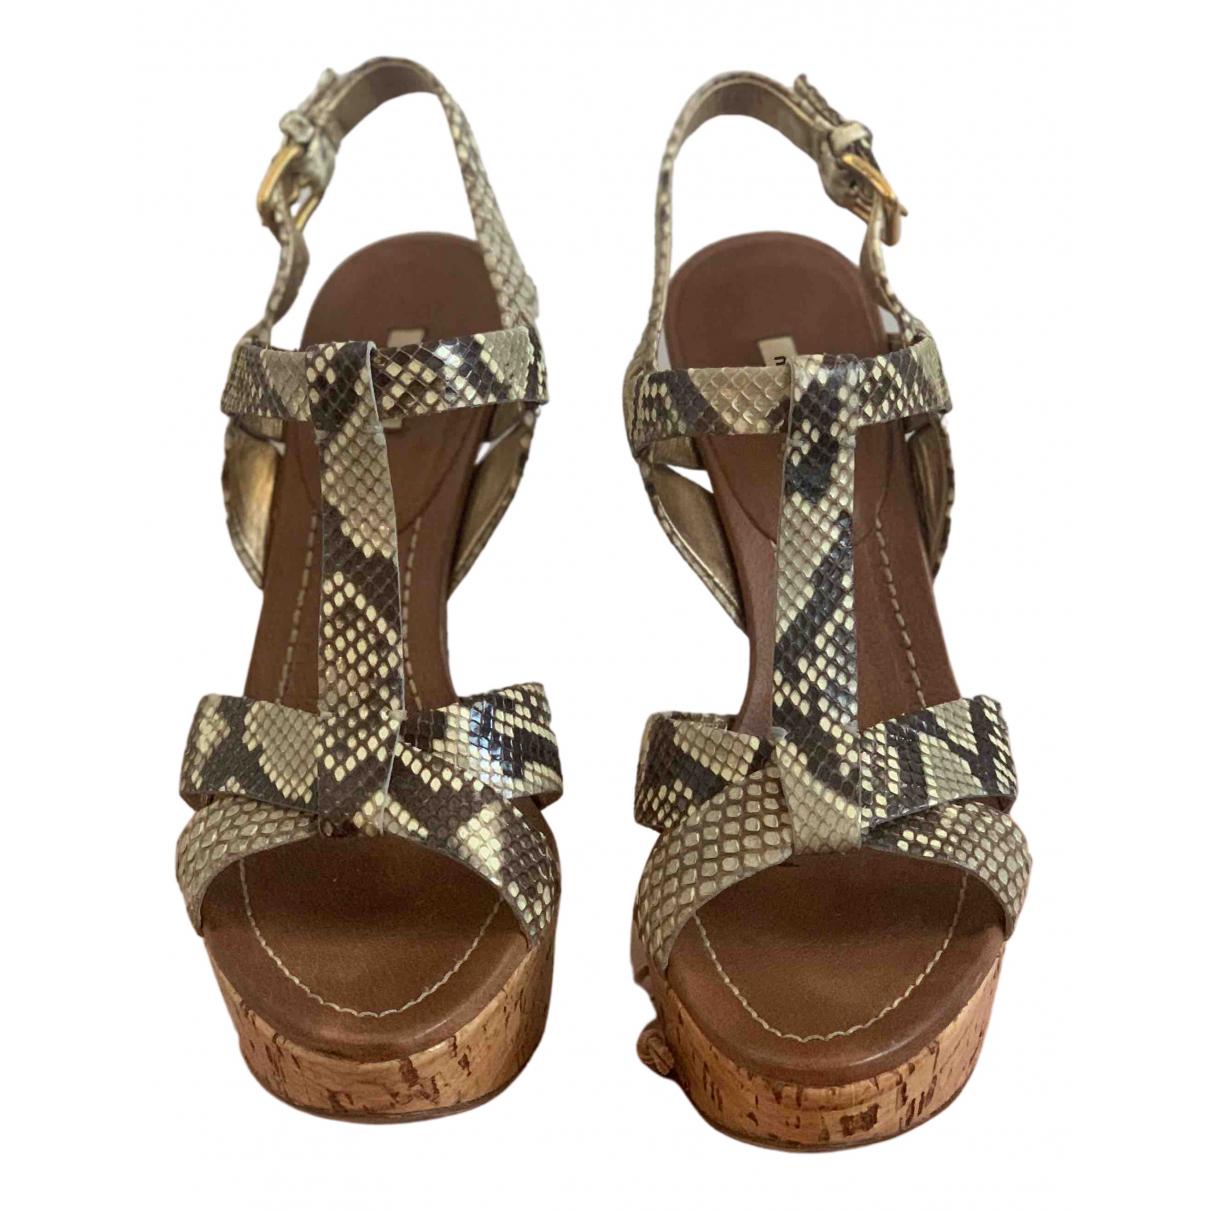 Miu Miu N Brown Fur Sandals for Women 36.5 EU